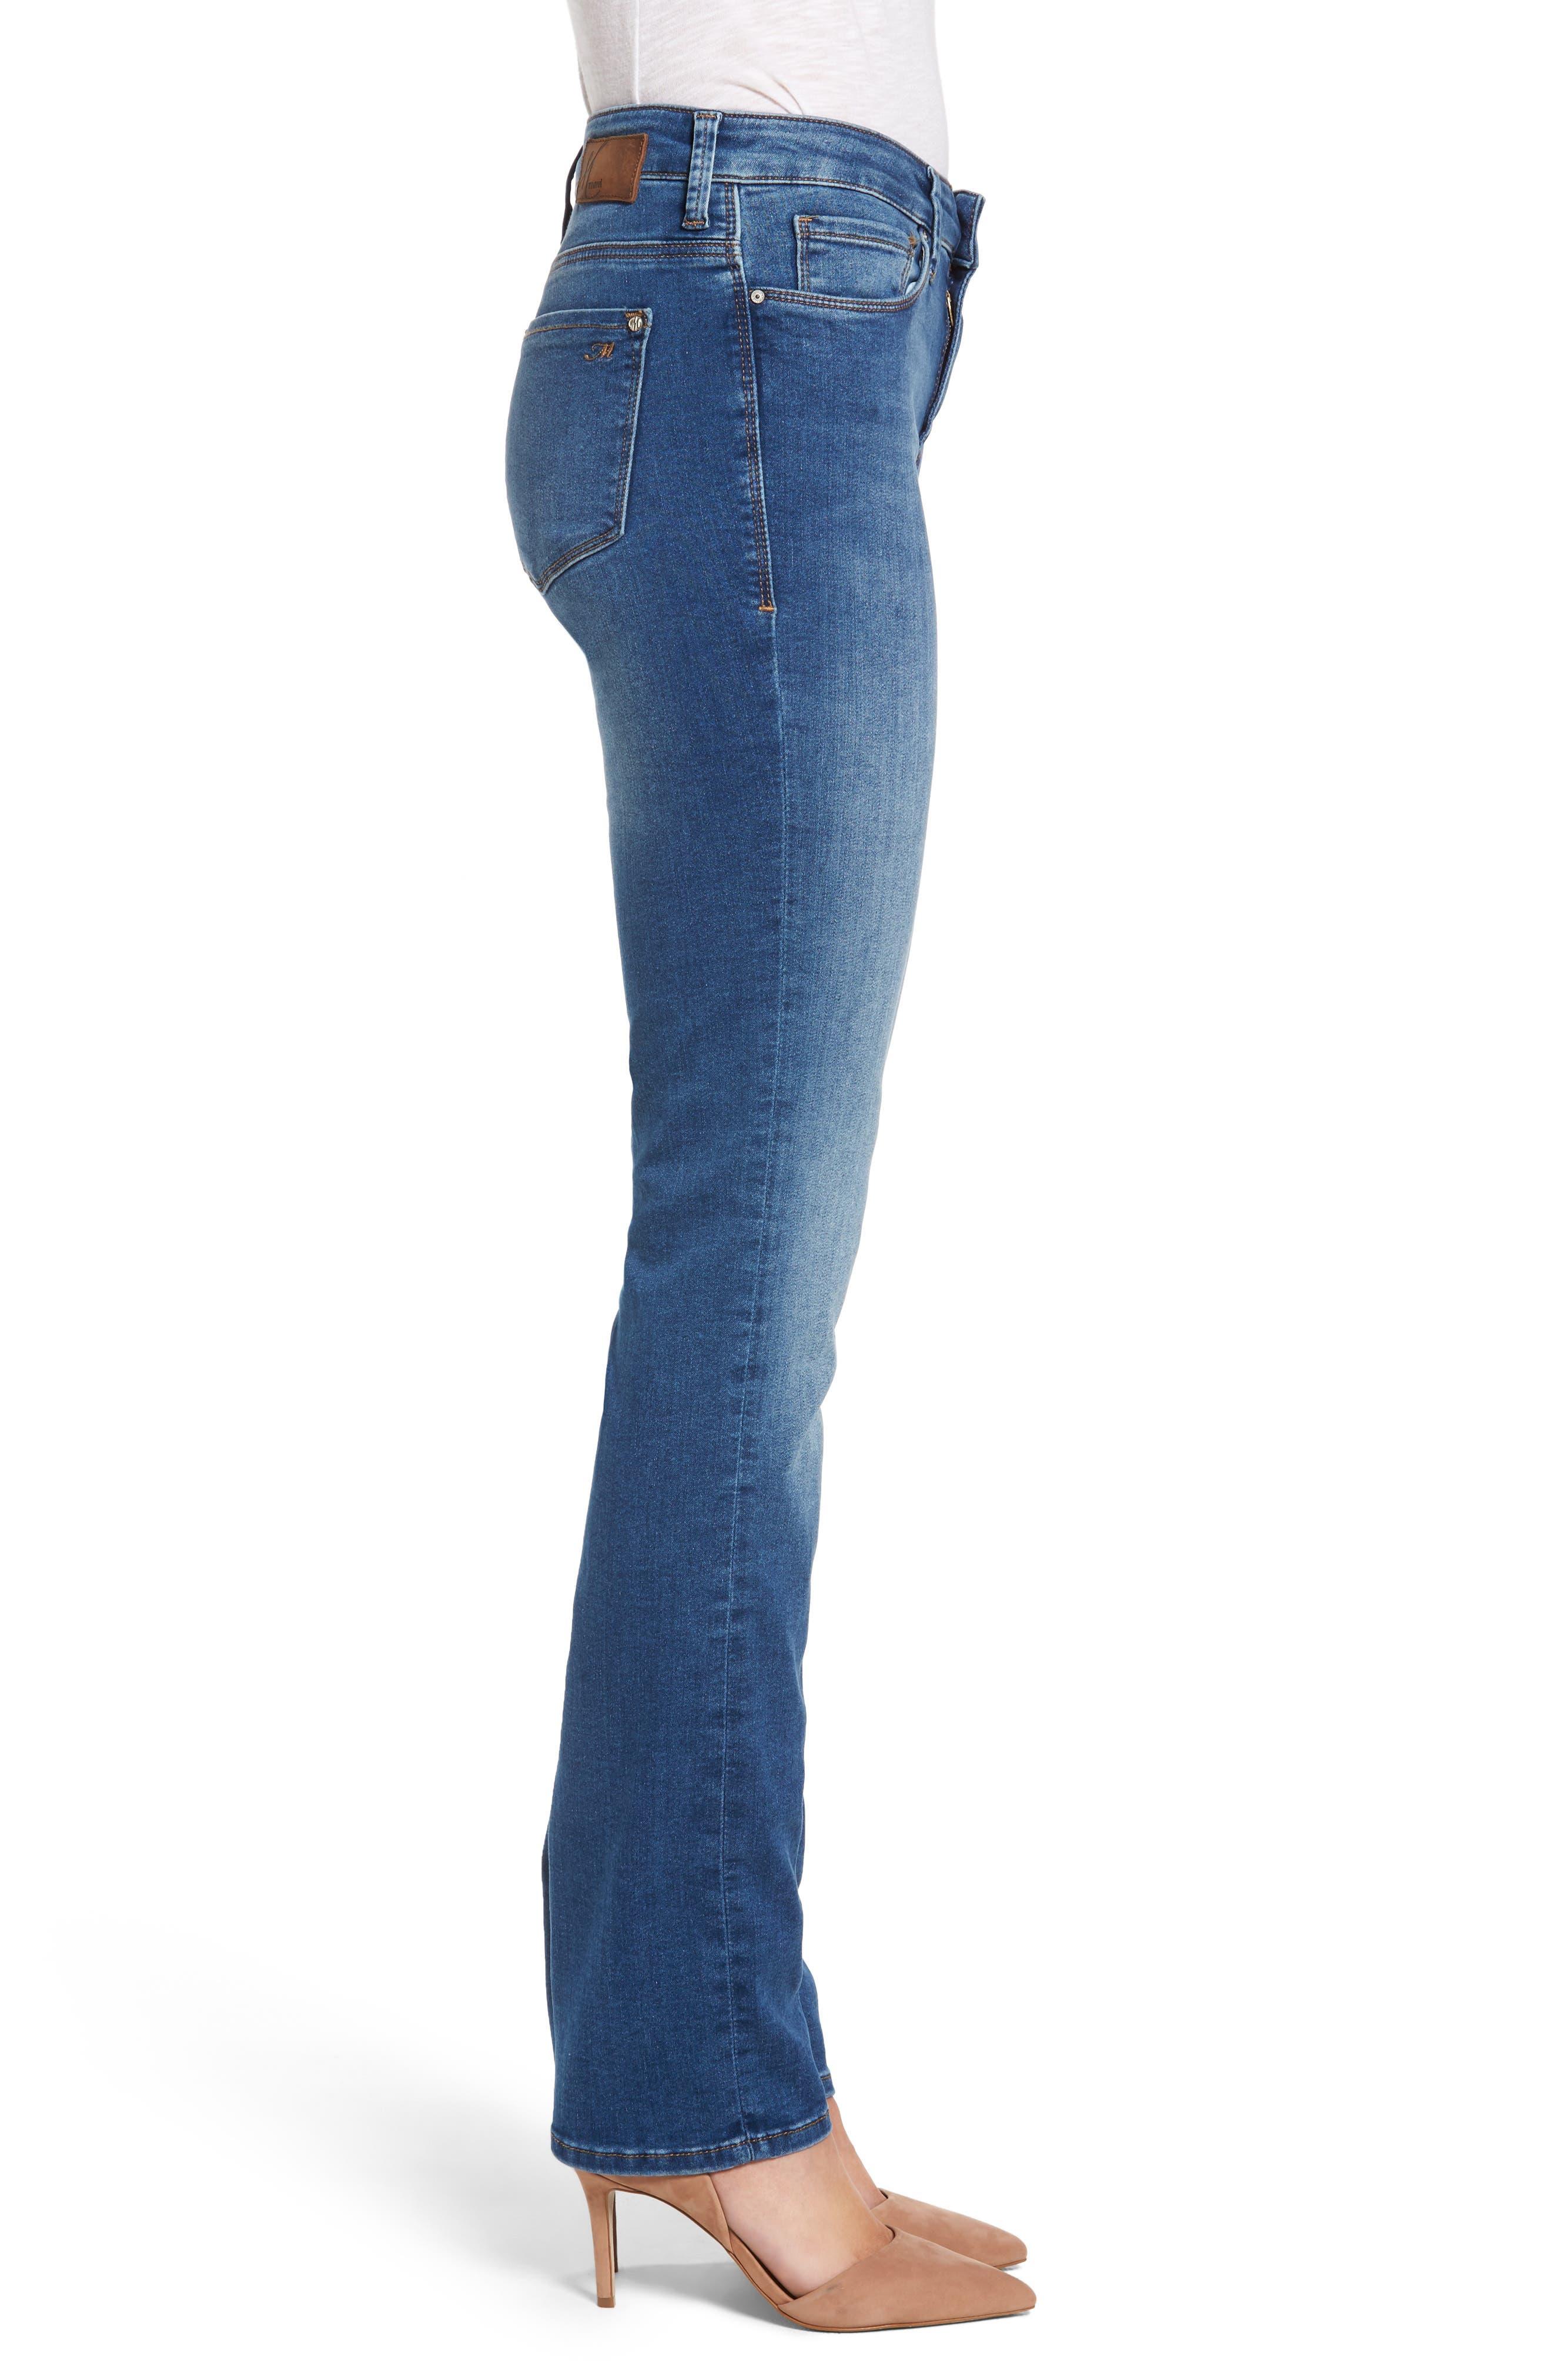 Alternate Image 3  - Mavi Jeans Kendra High Waist Stretch Denim Jeans (Mid Soft Shanti)